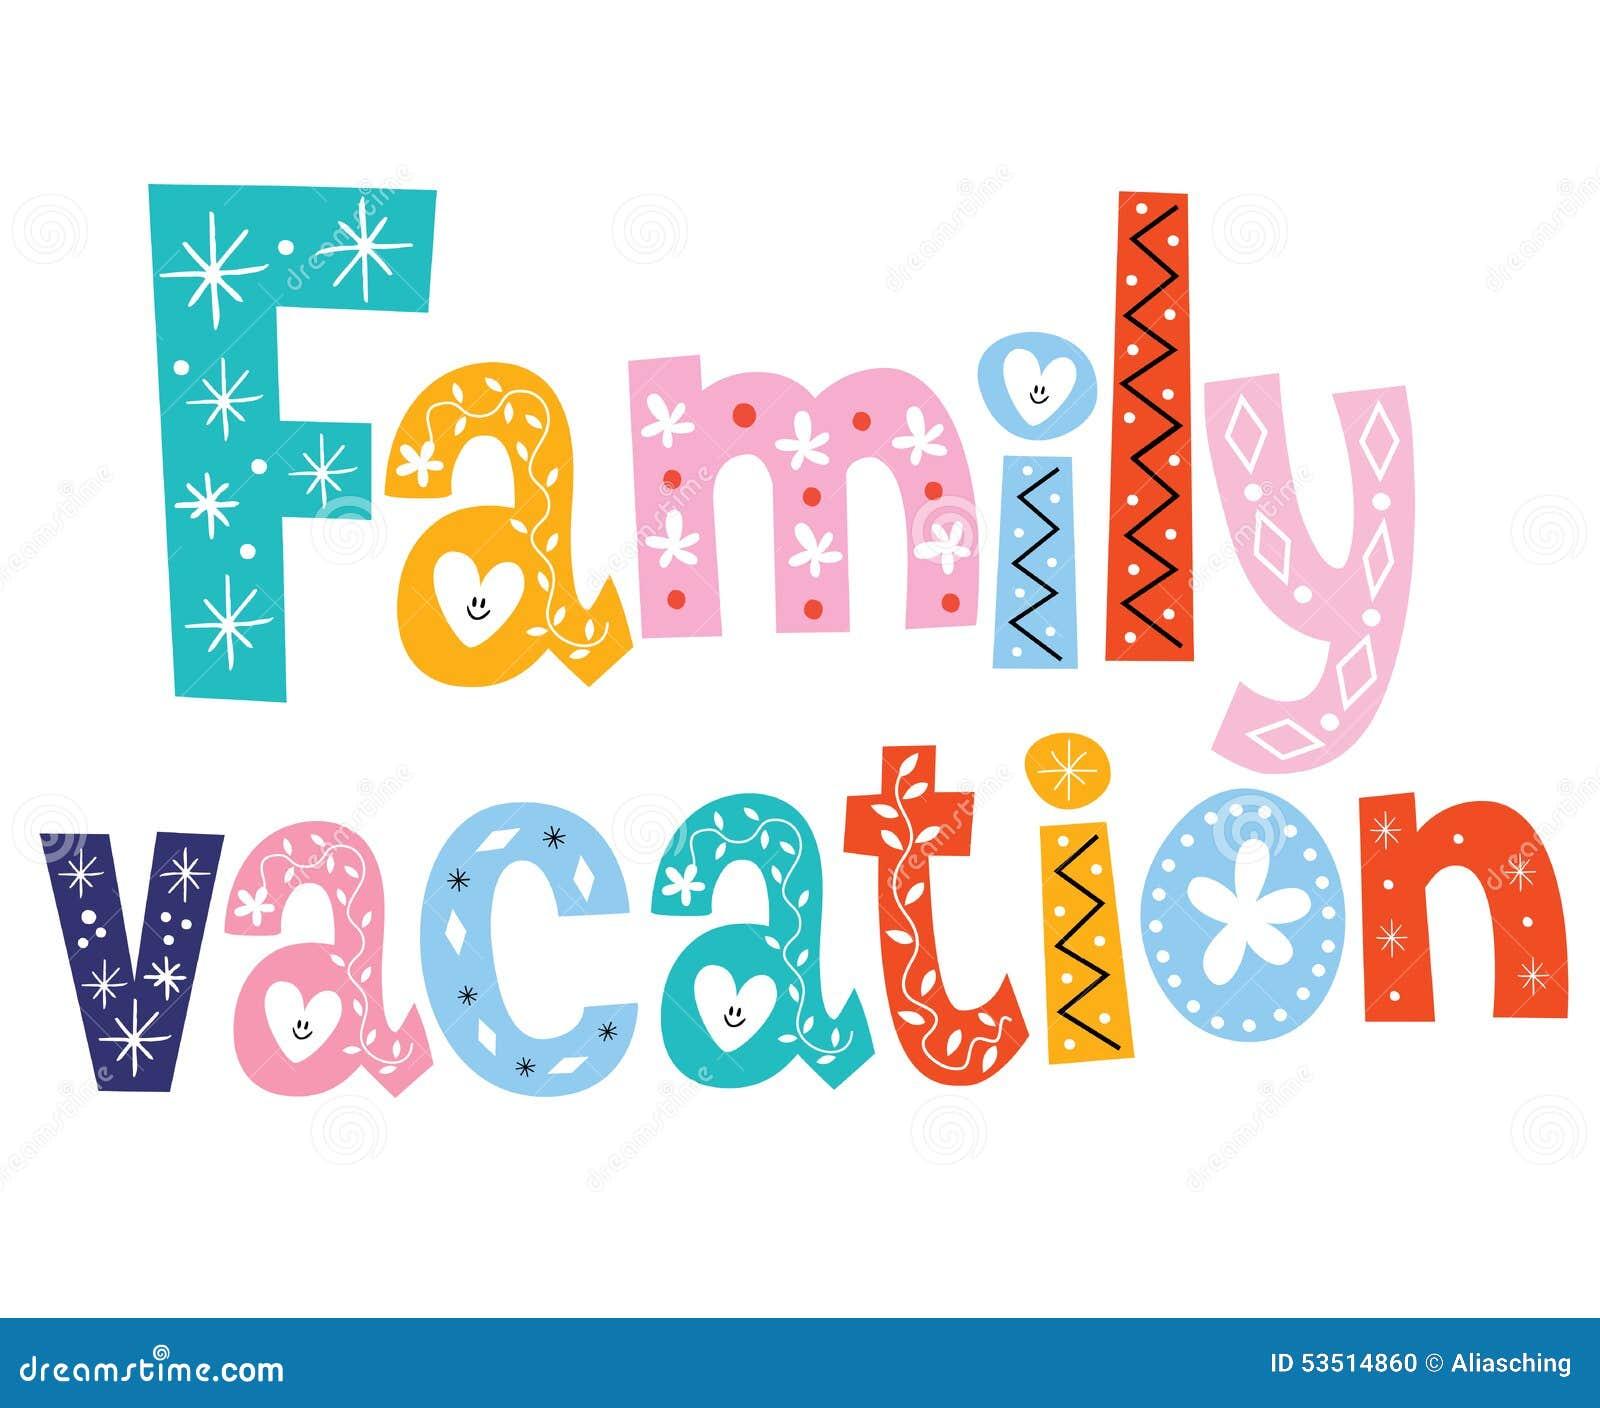 Family vacation stock vector. Illustration of decorative ...